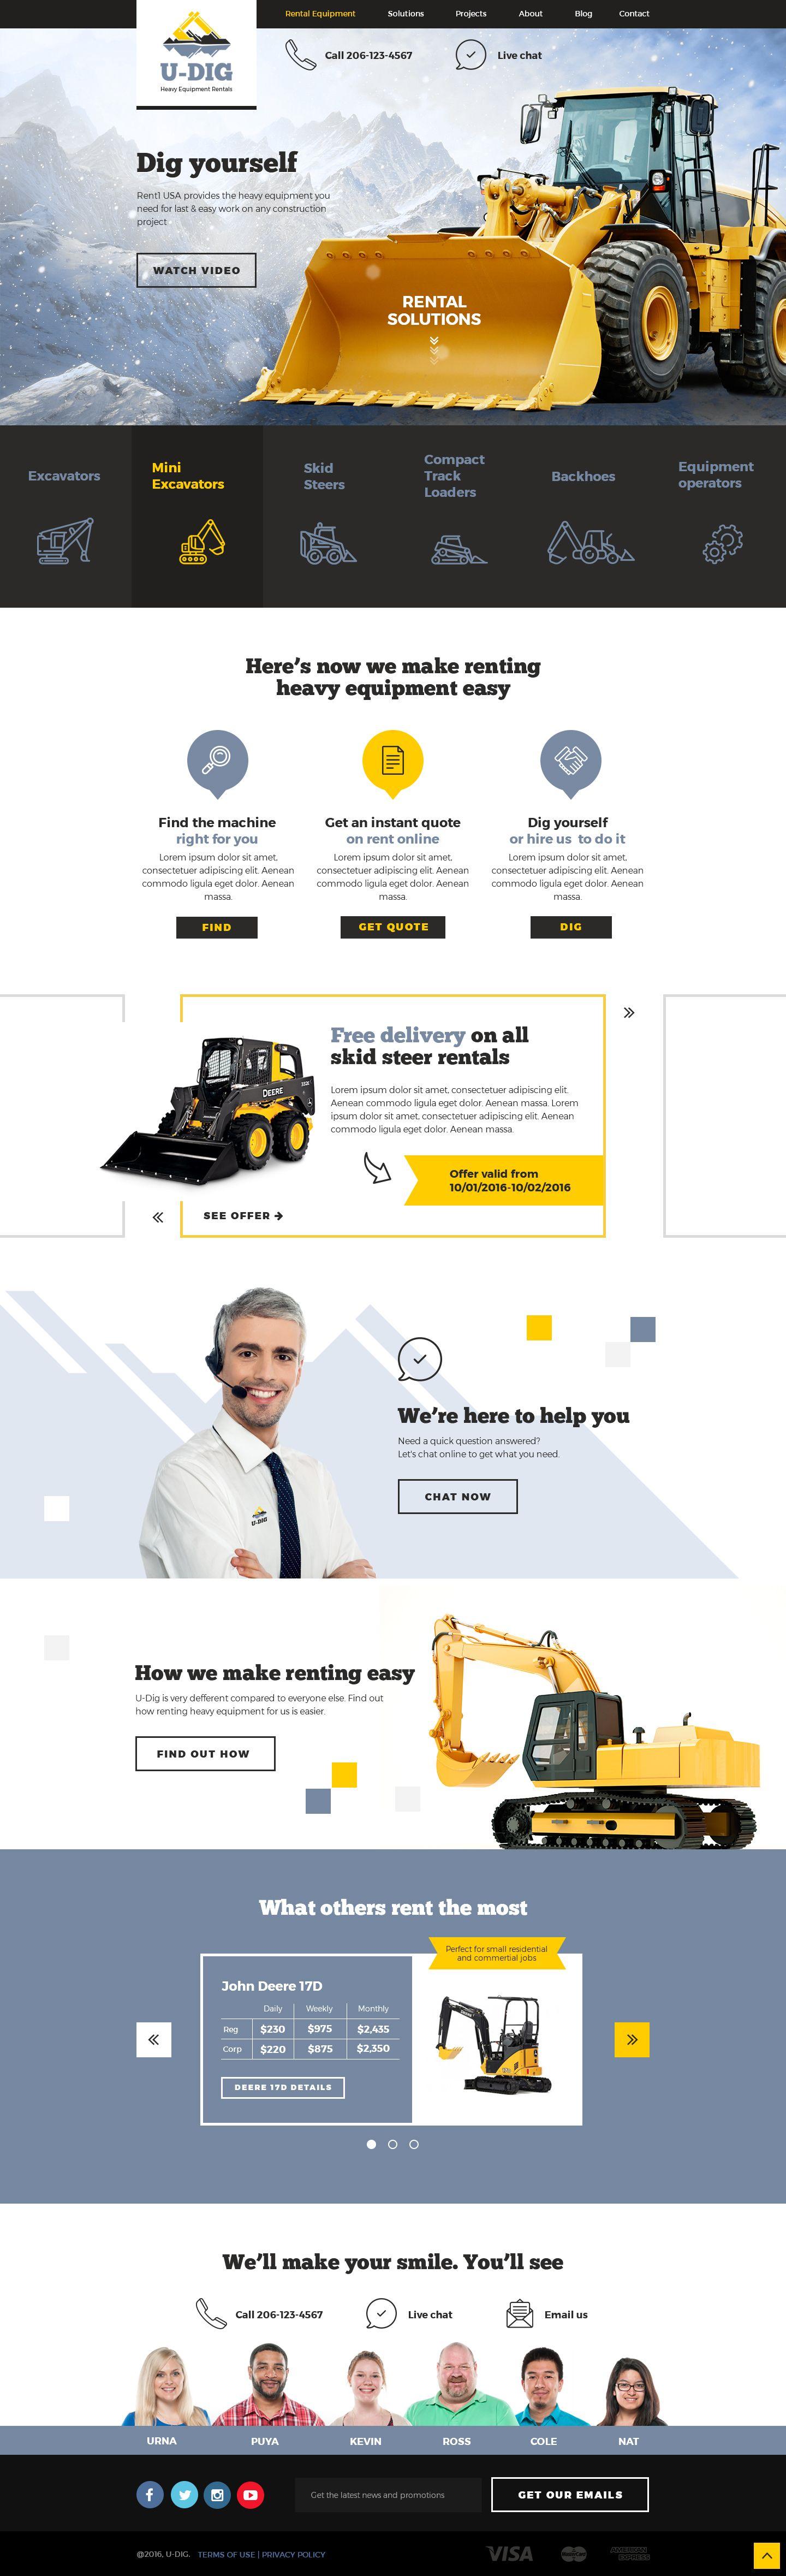 Website U-DIG. Heavy Equipment Rentals | Web development ...